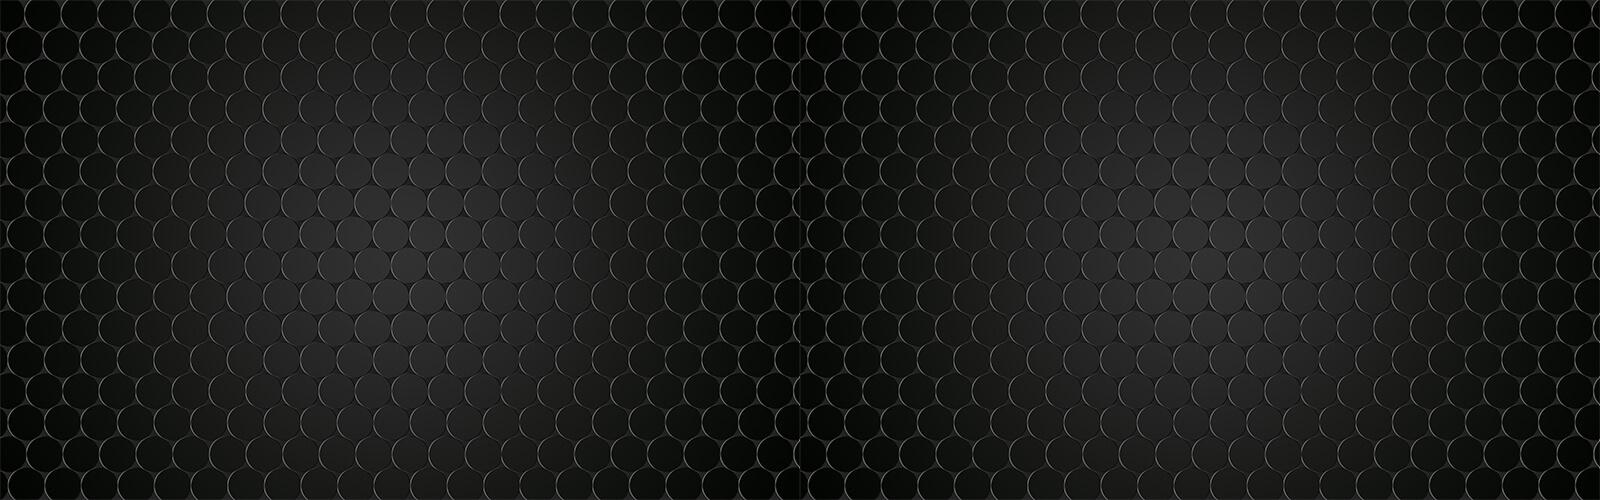 Microsoft Background